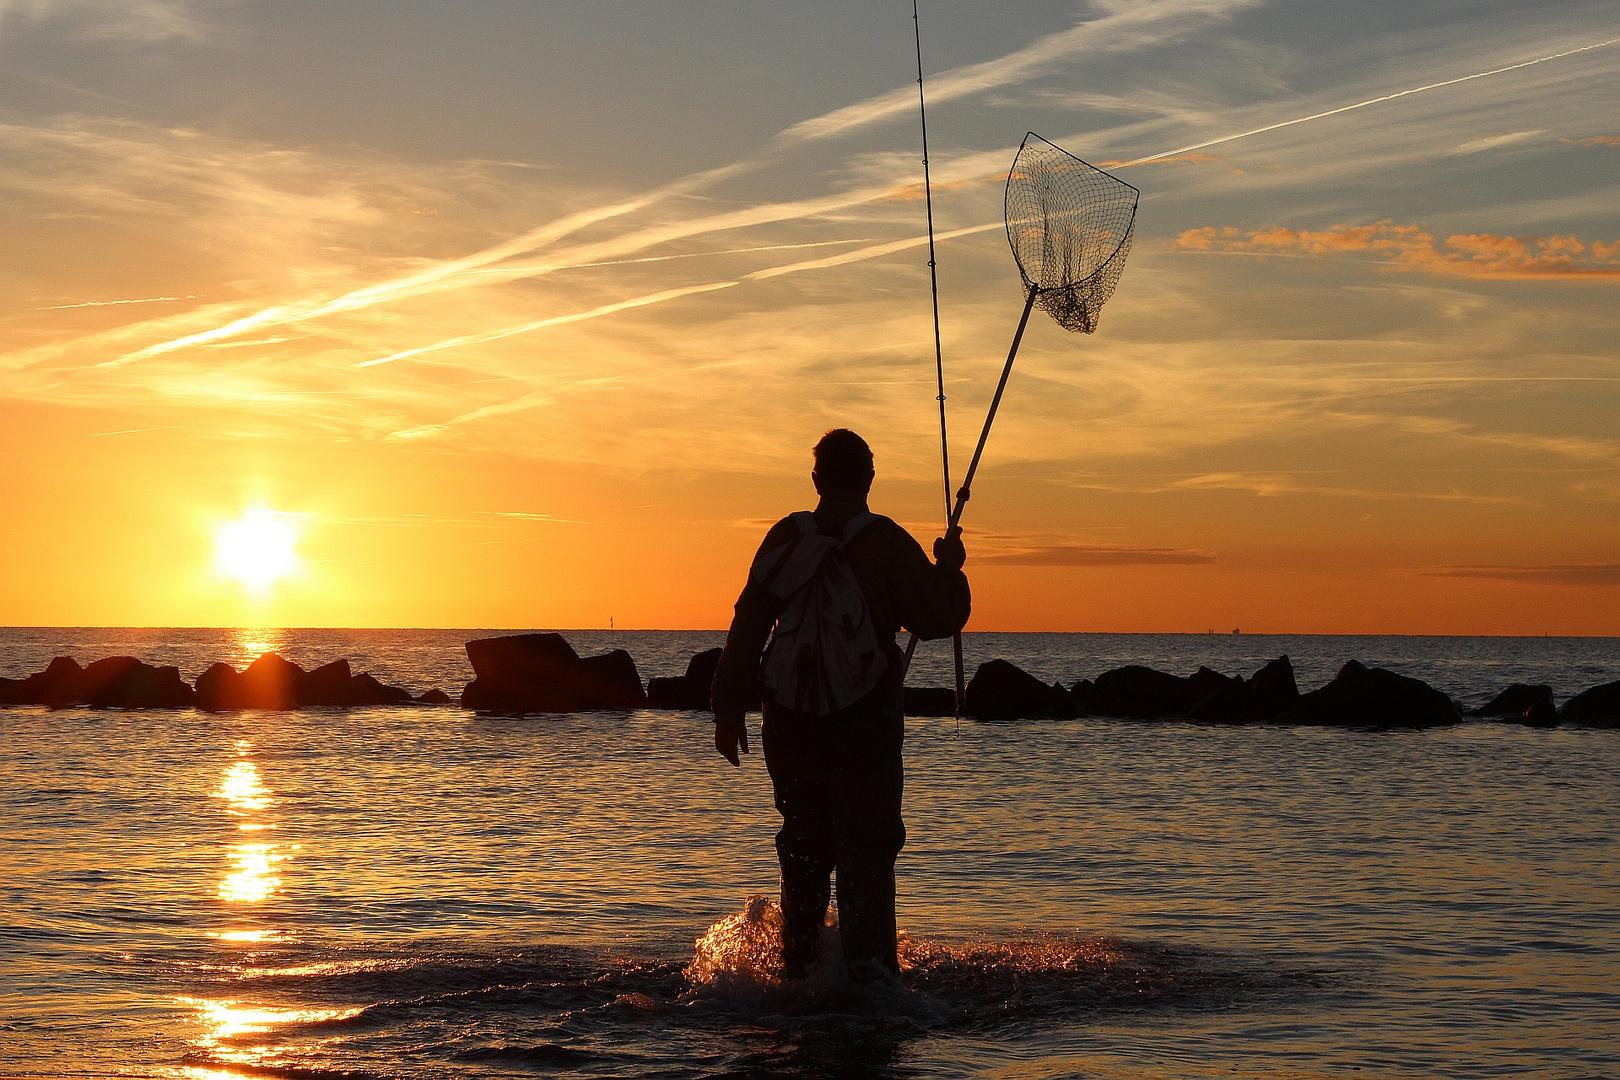 angeln in den Sonnenuntergang ...